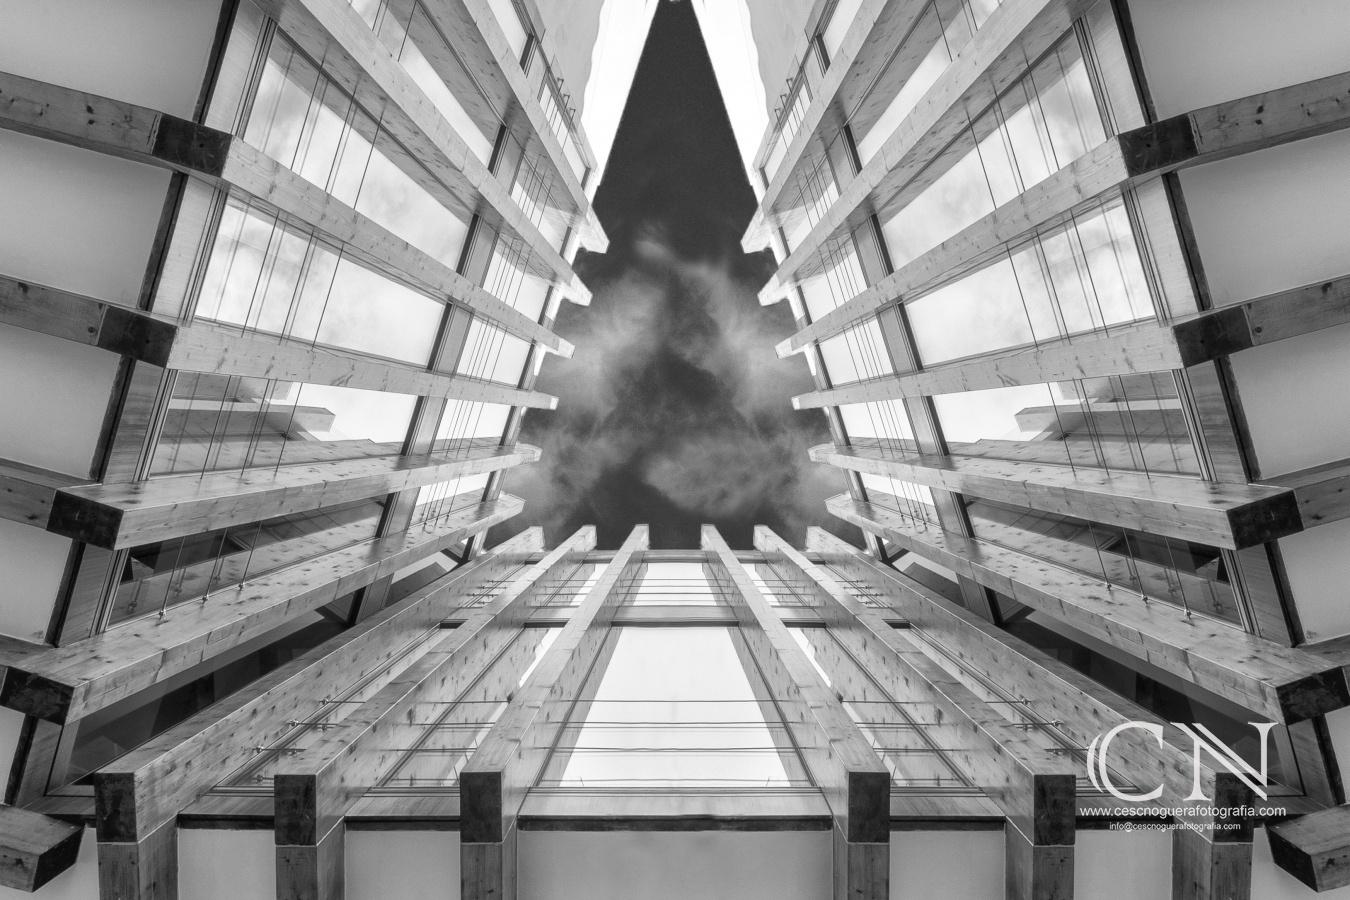 Real Estate Photography  - Cesc Noguera Fotografie, Wenn Fotografie ist eine Leidenschaft, Architectural & Interior design photographer / Landscape Photography